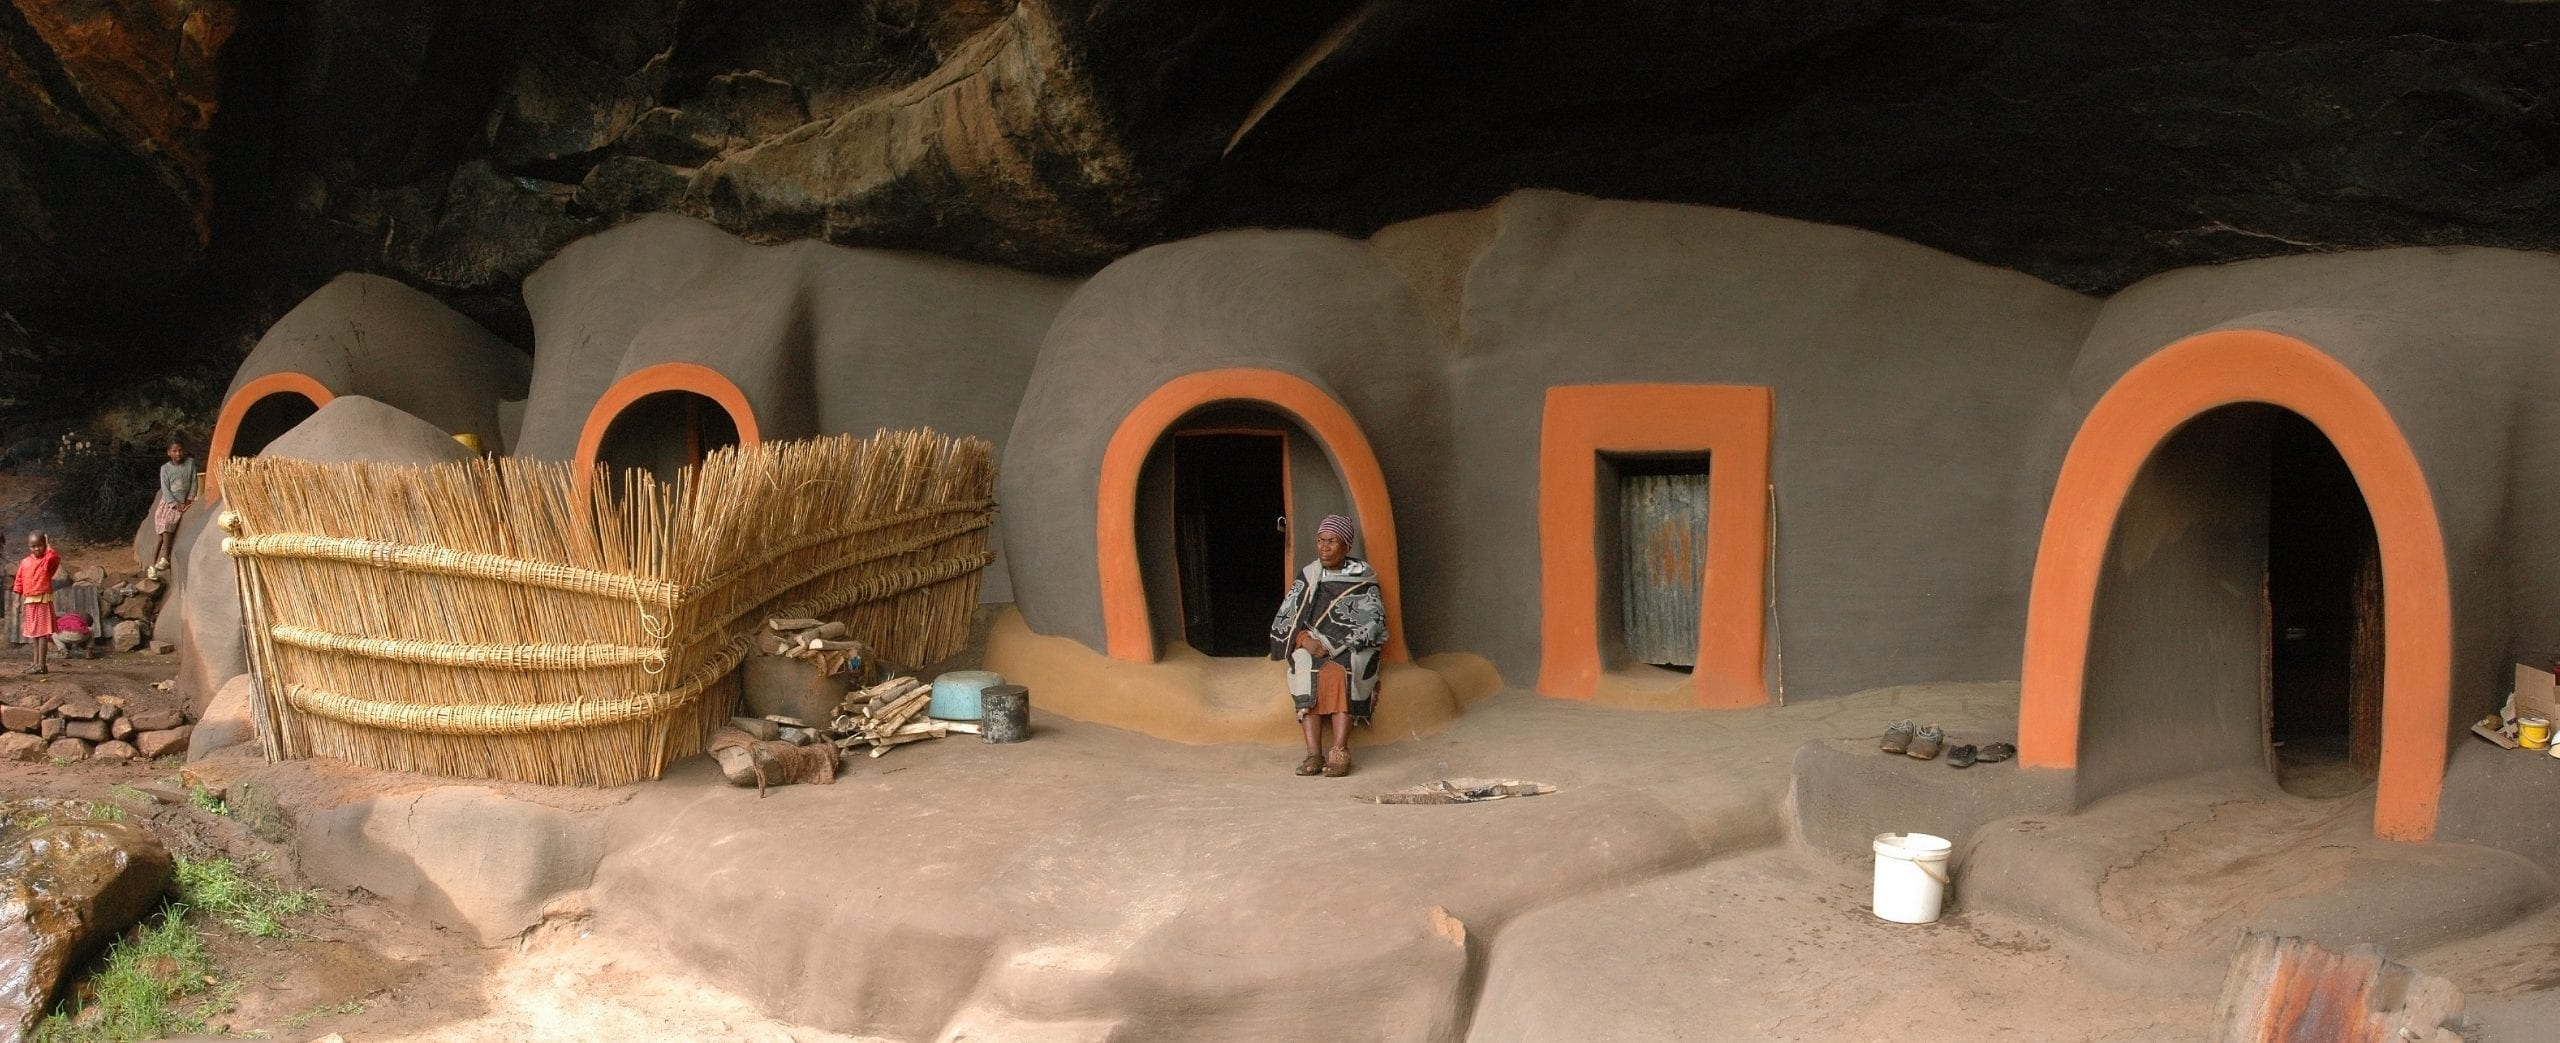 Ha Kome Caves